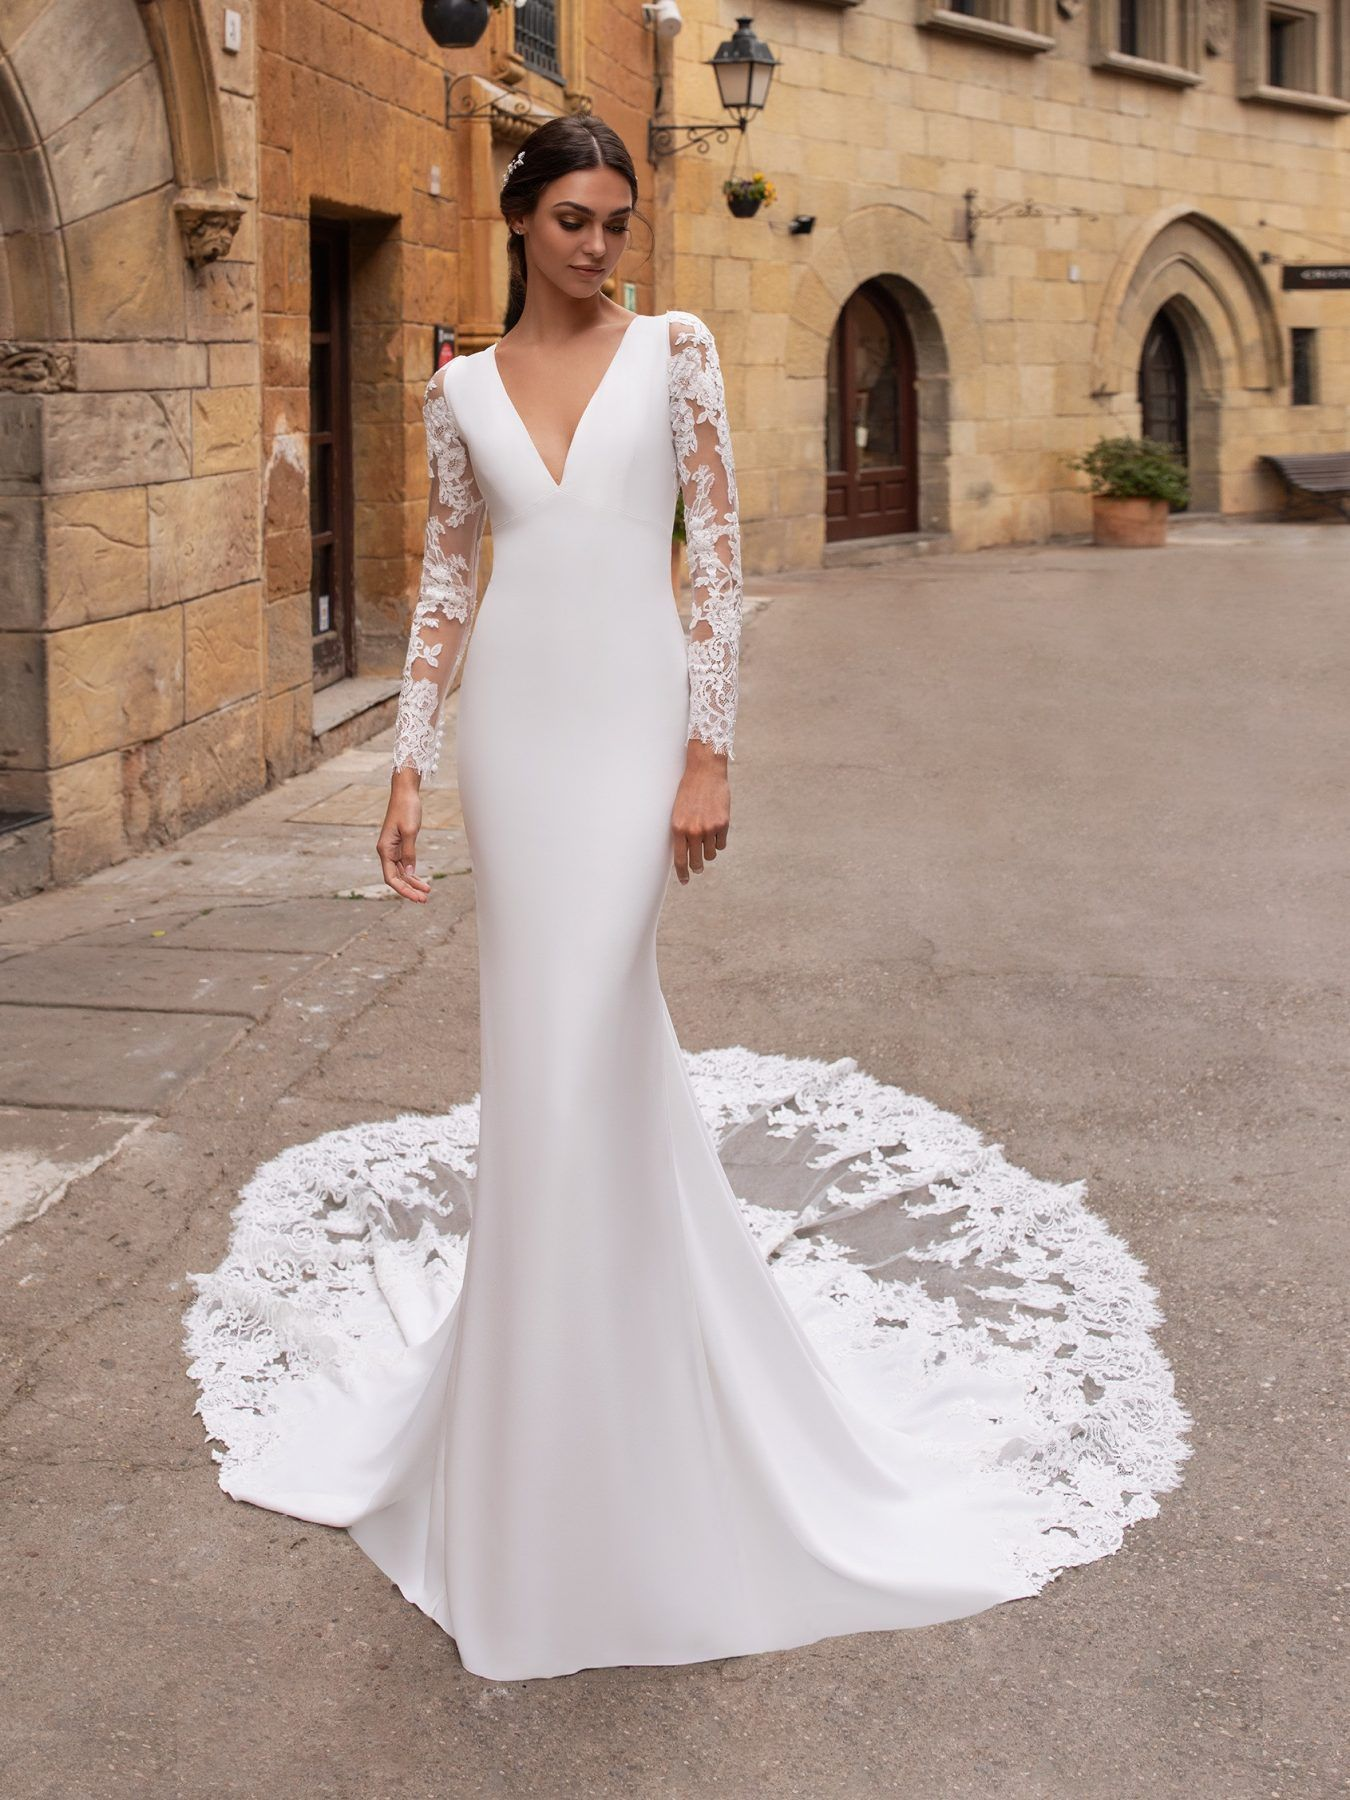 Illusion Long Sleeve V Neckline Crepe Sheath Wedding Dress Kleinfeld Bridal Wedding Dresses Kleinfeld Long Sleeve Wedding Dress Lace Wedding Dress Sleeves [ 1800 x 1350 Pixel ]